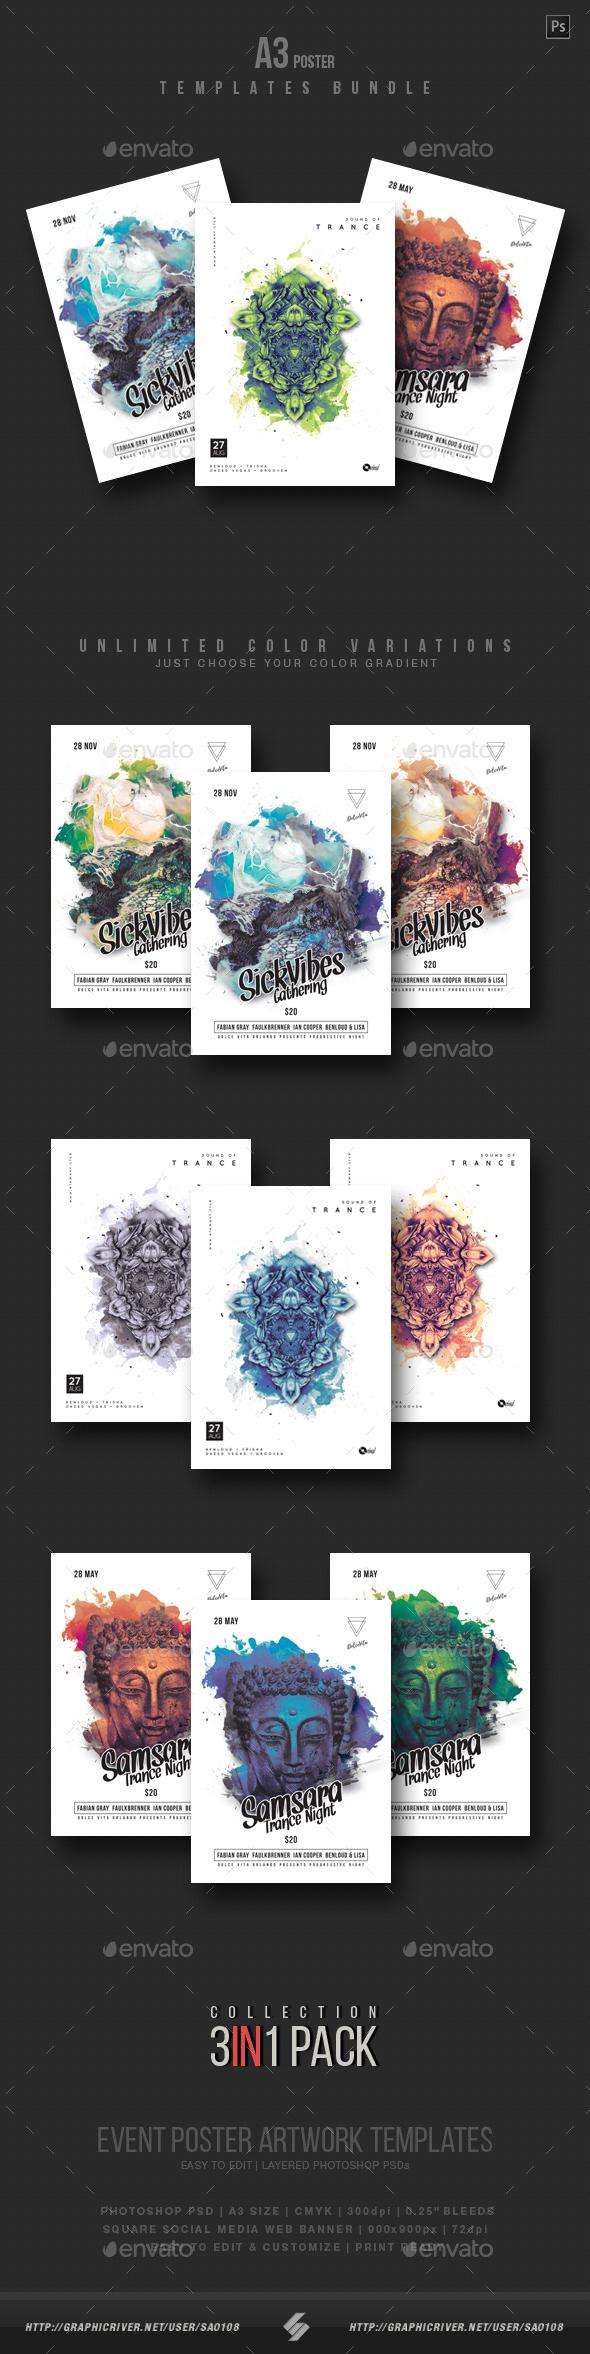 Creative Sound vol5 - Party Flyer Templates Bundle A3 - Clubs & Parties Events